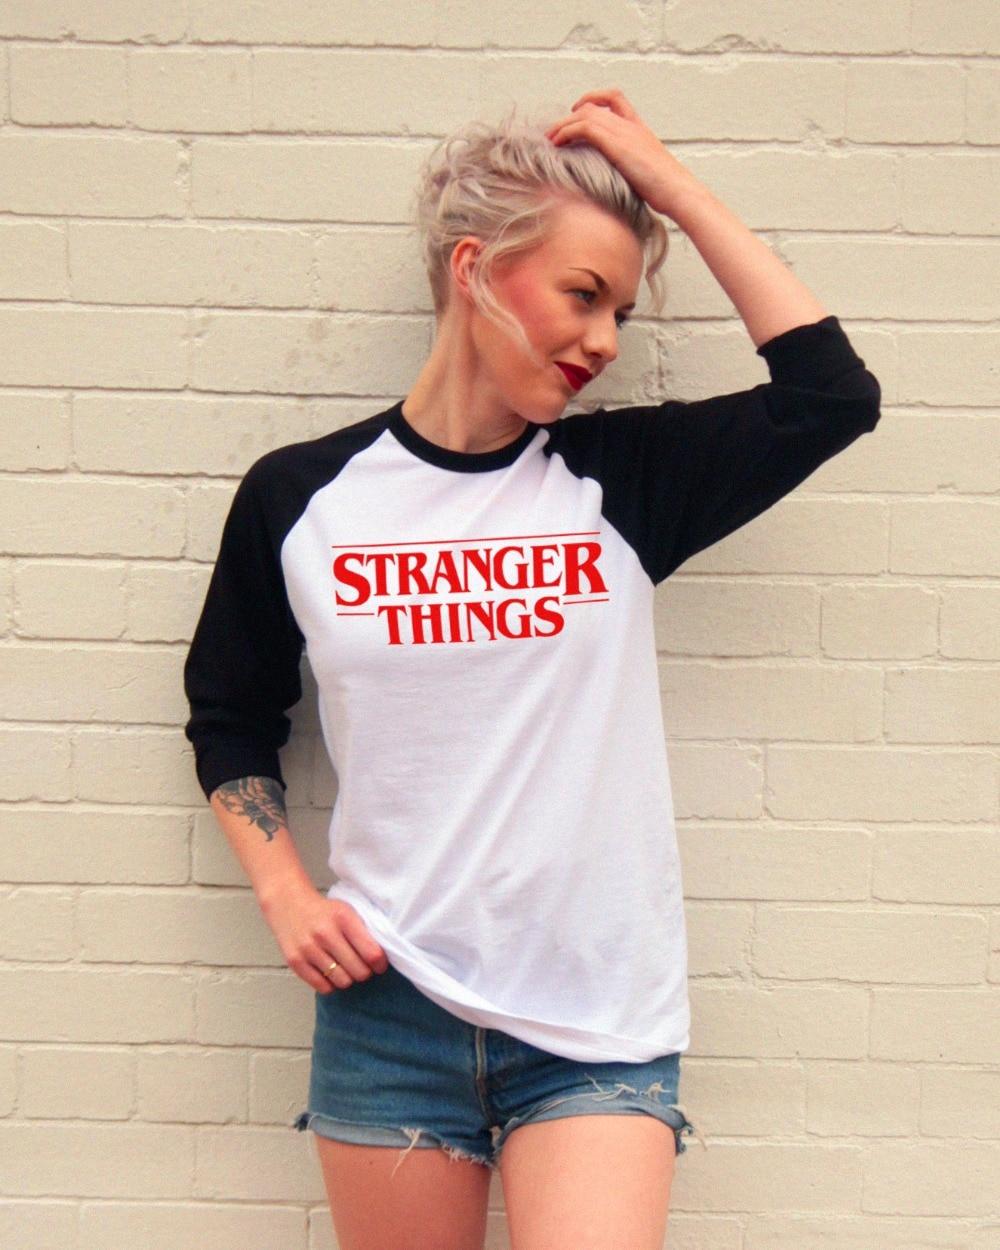 American vintage estilo Ringer Camisetas Tees algodón manga larga Camisetas  stranger things letra del remiendo camiseta ropa de moda femenina 1a71209e274bf